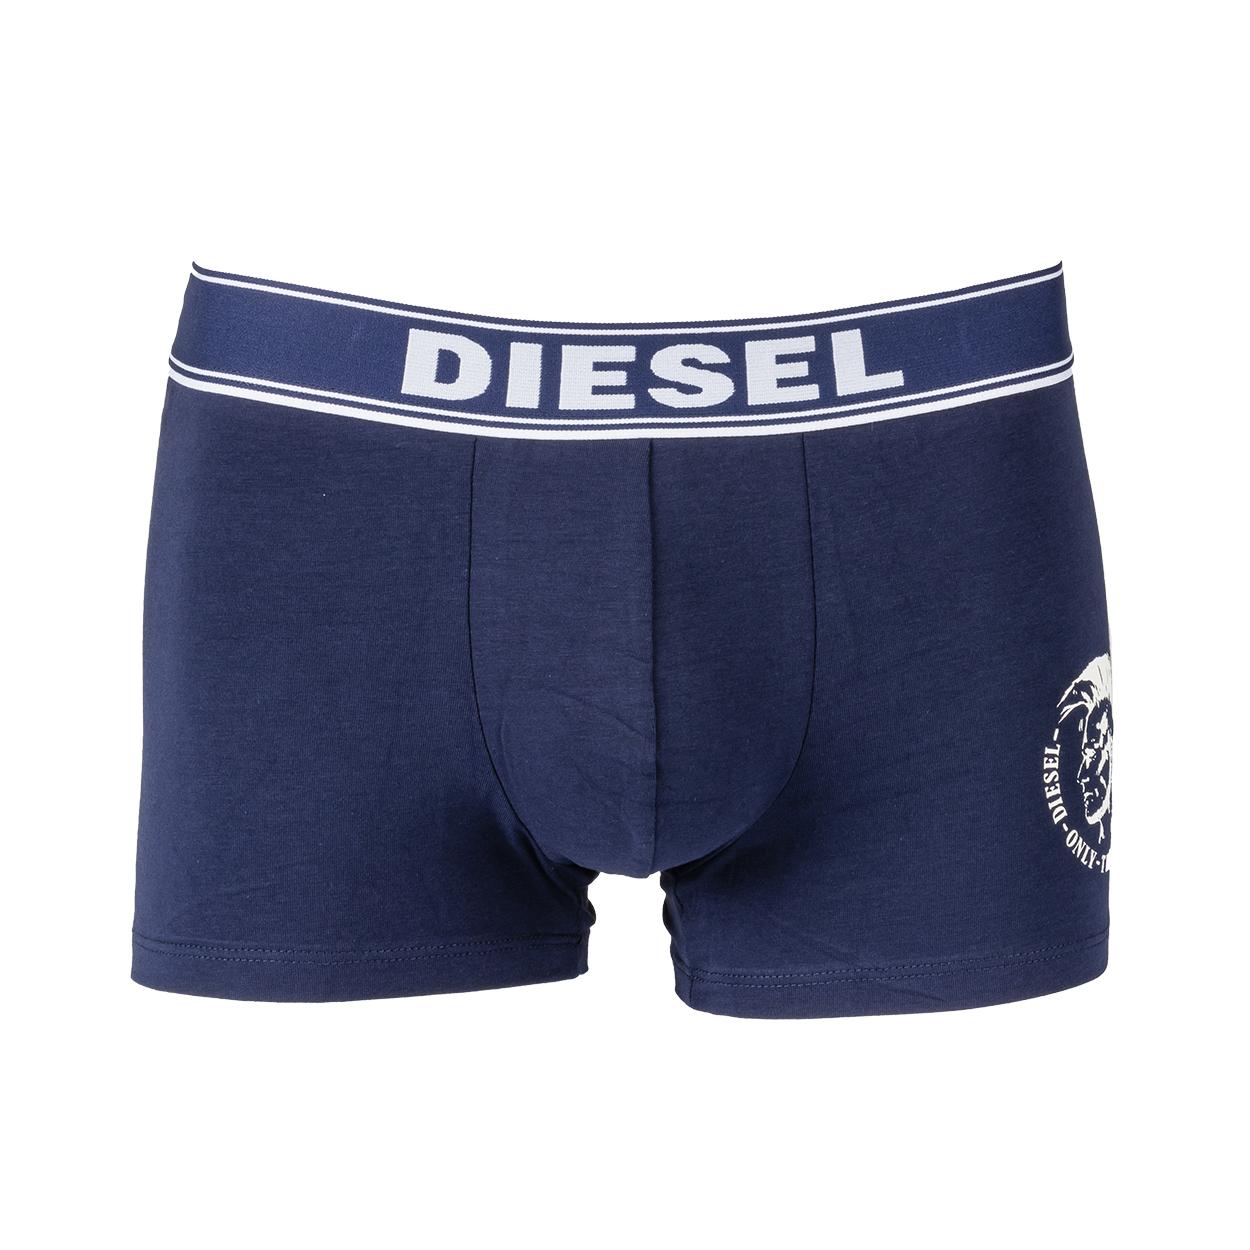 Boxer diesel shawn en coton stretch bleu marine floqué en blanc